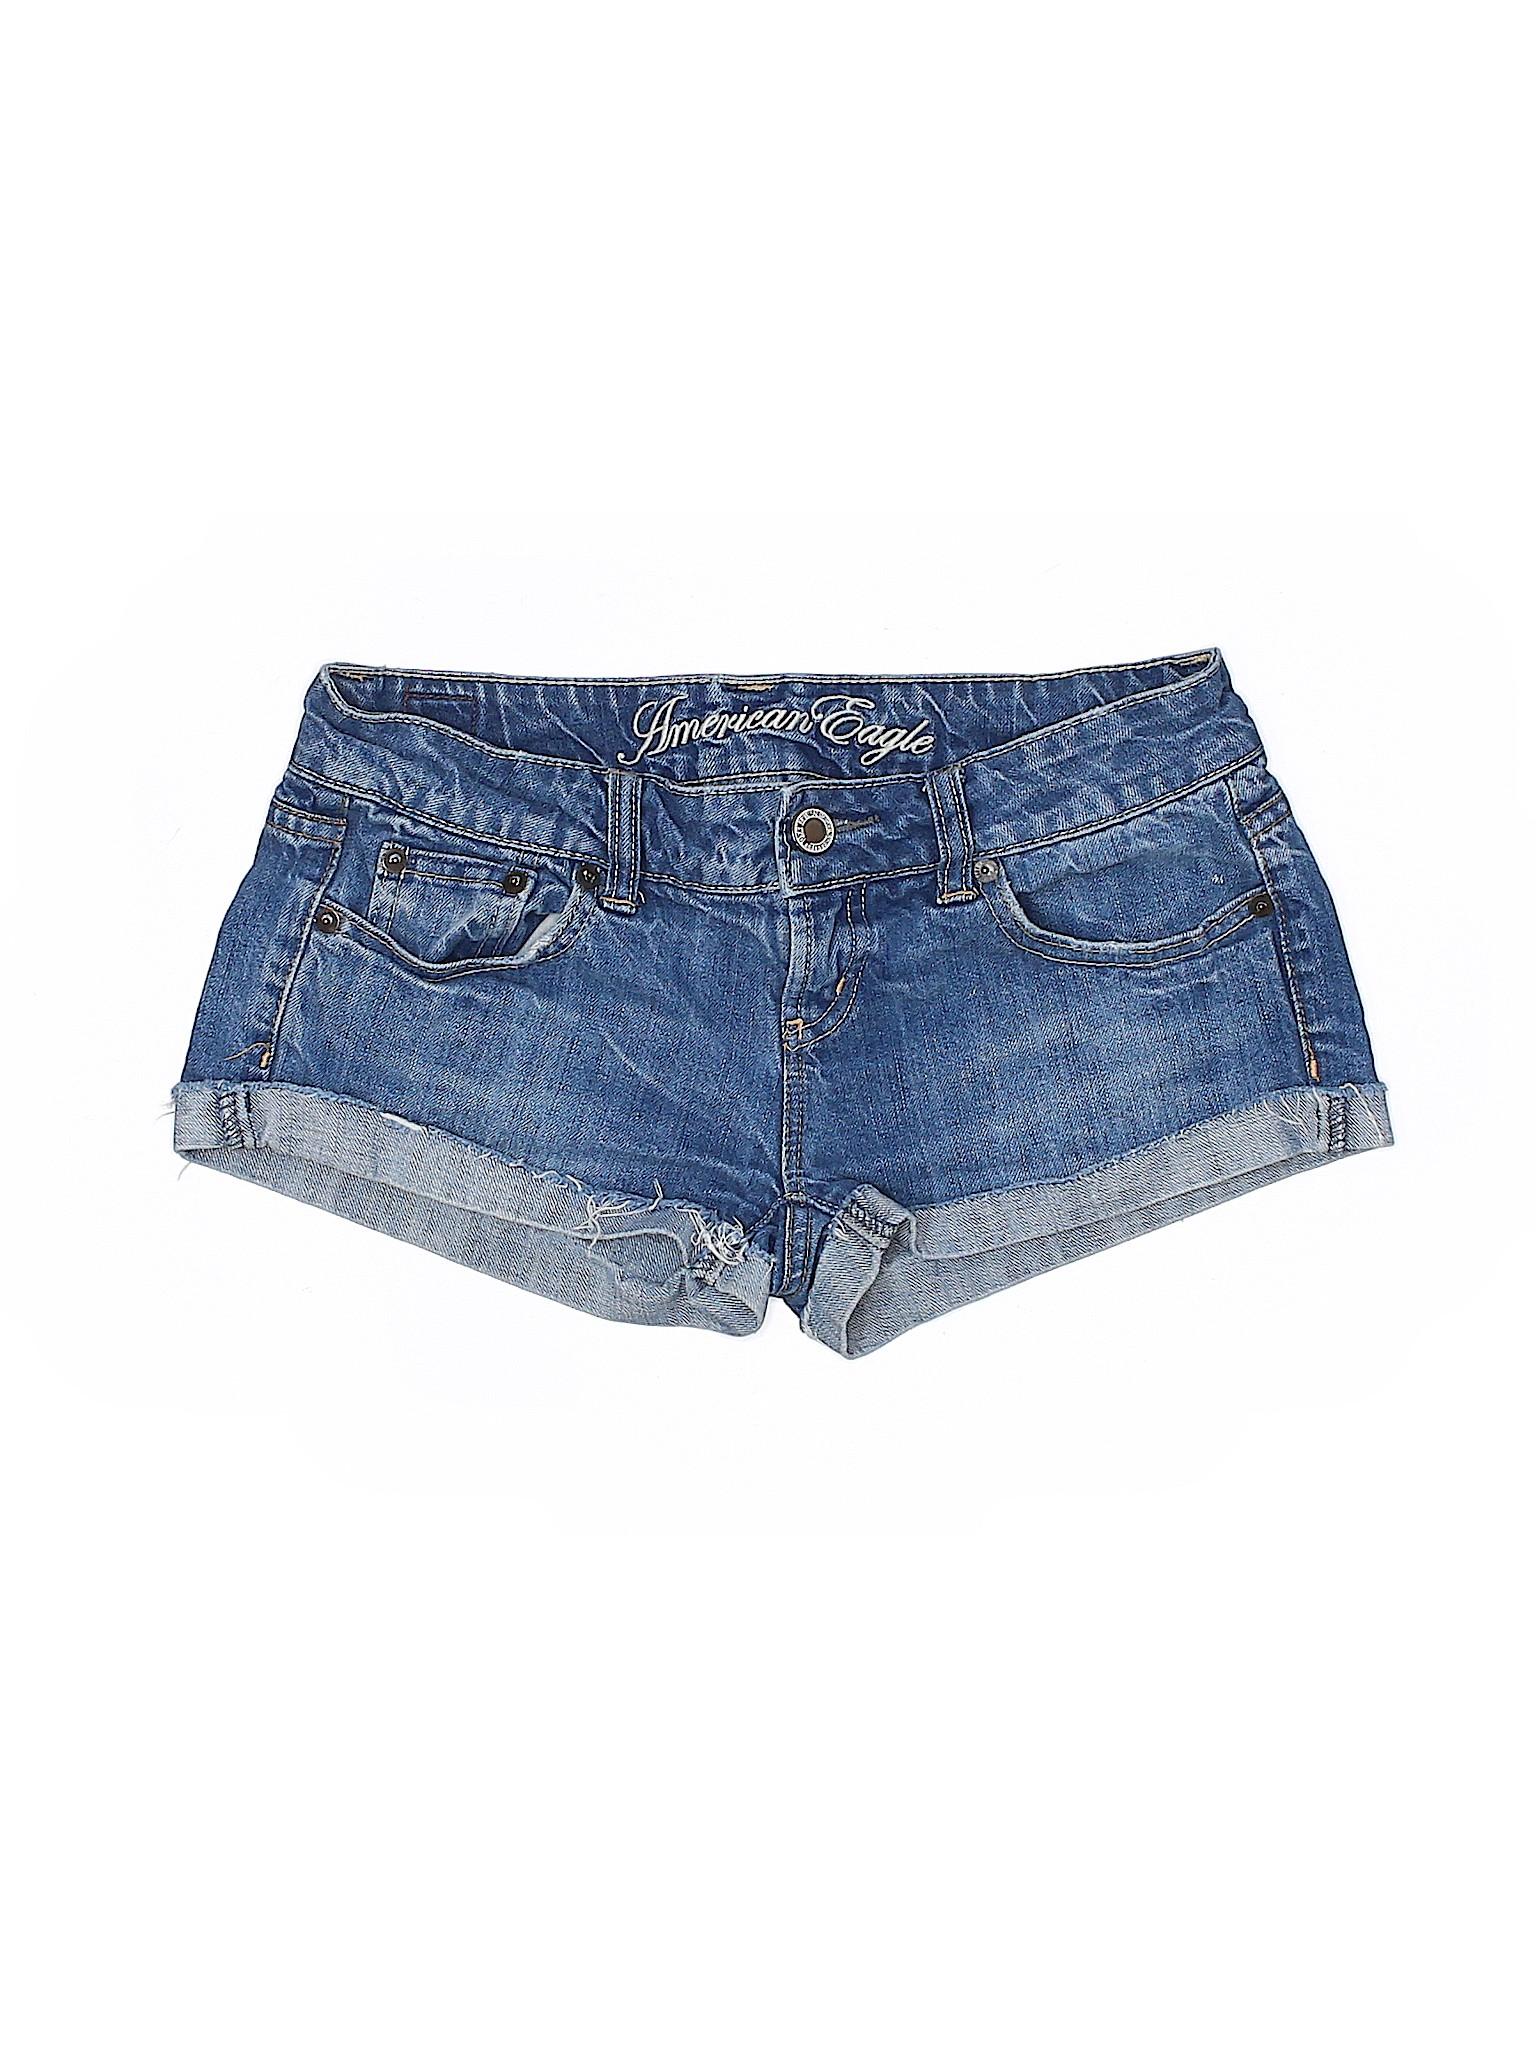 Denim Eagle American Shorts leisure Outfitters Boutique qRgYx